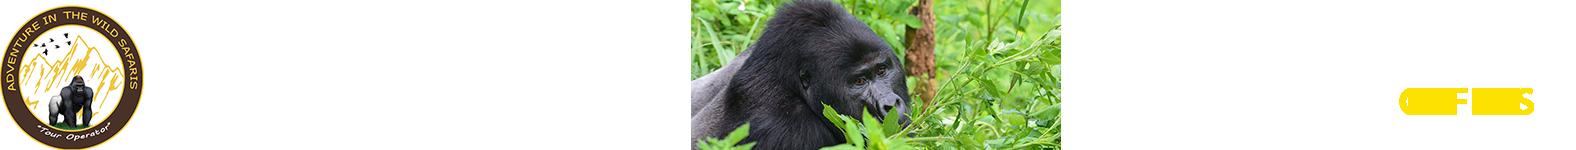 Bwindi Forest National Park | Uganda Gorilla Trekking